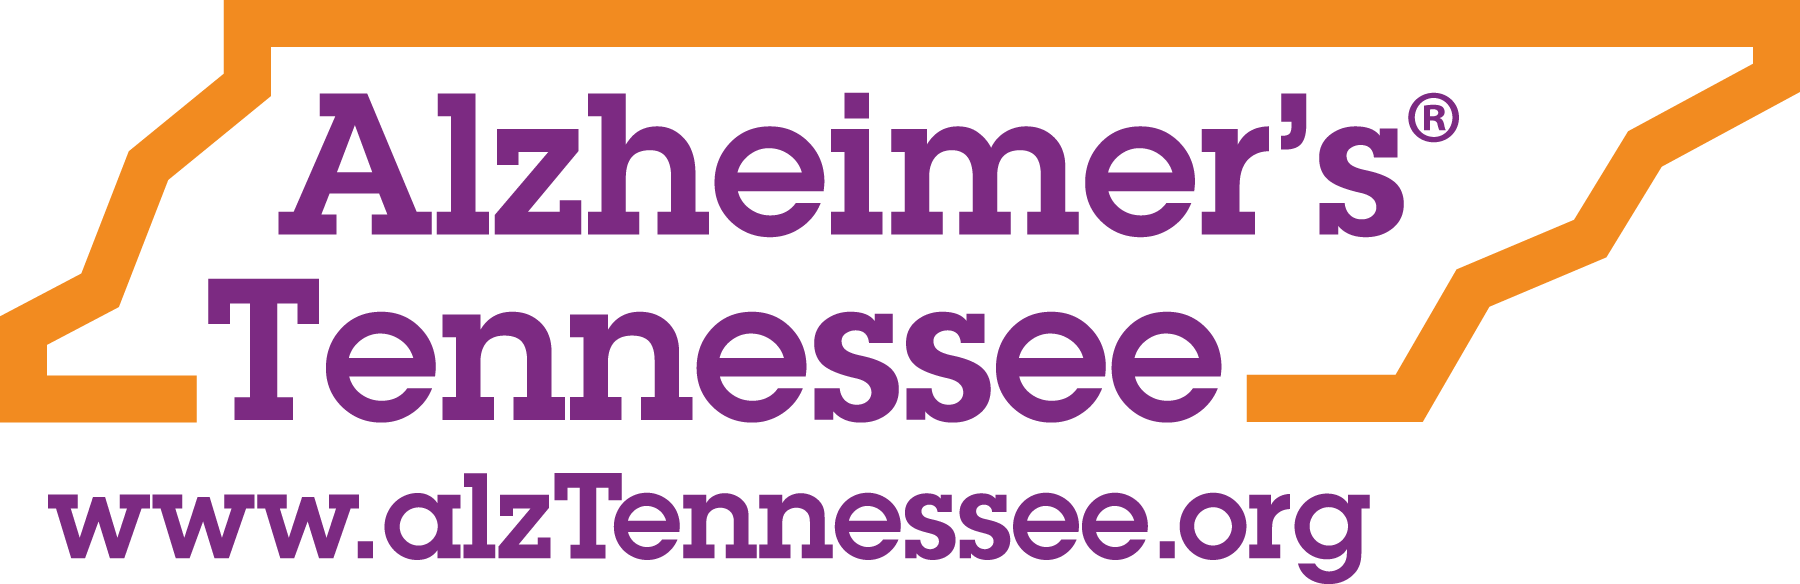 Alzheimer's Tennessee Logo